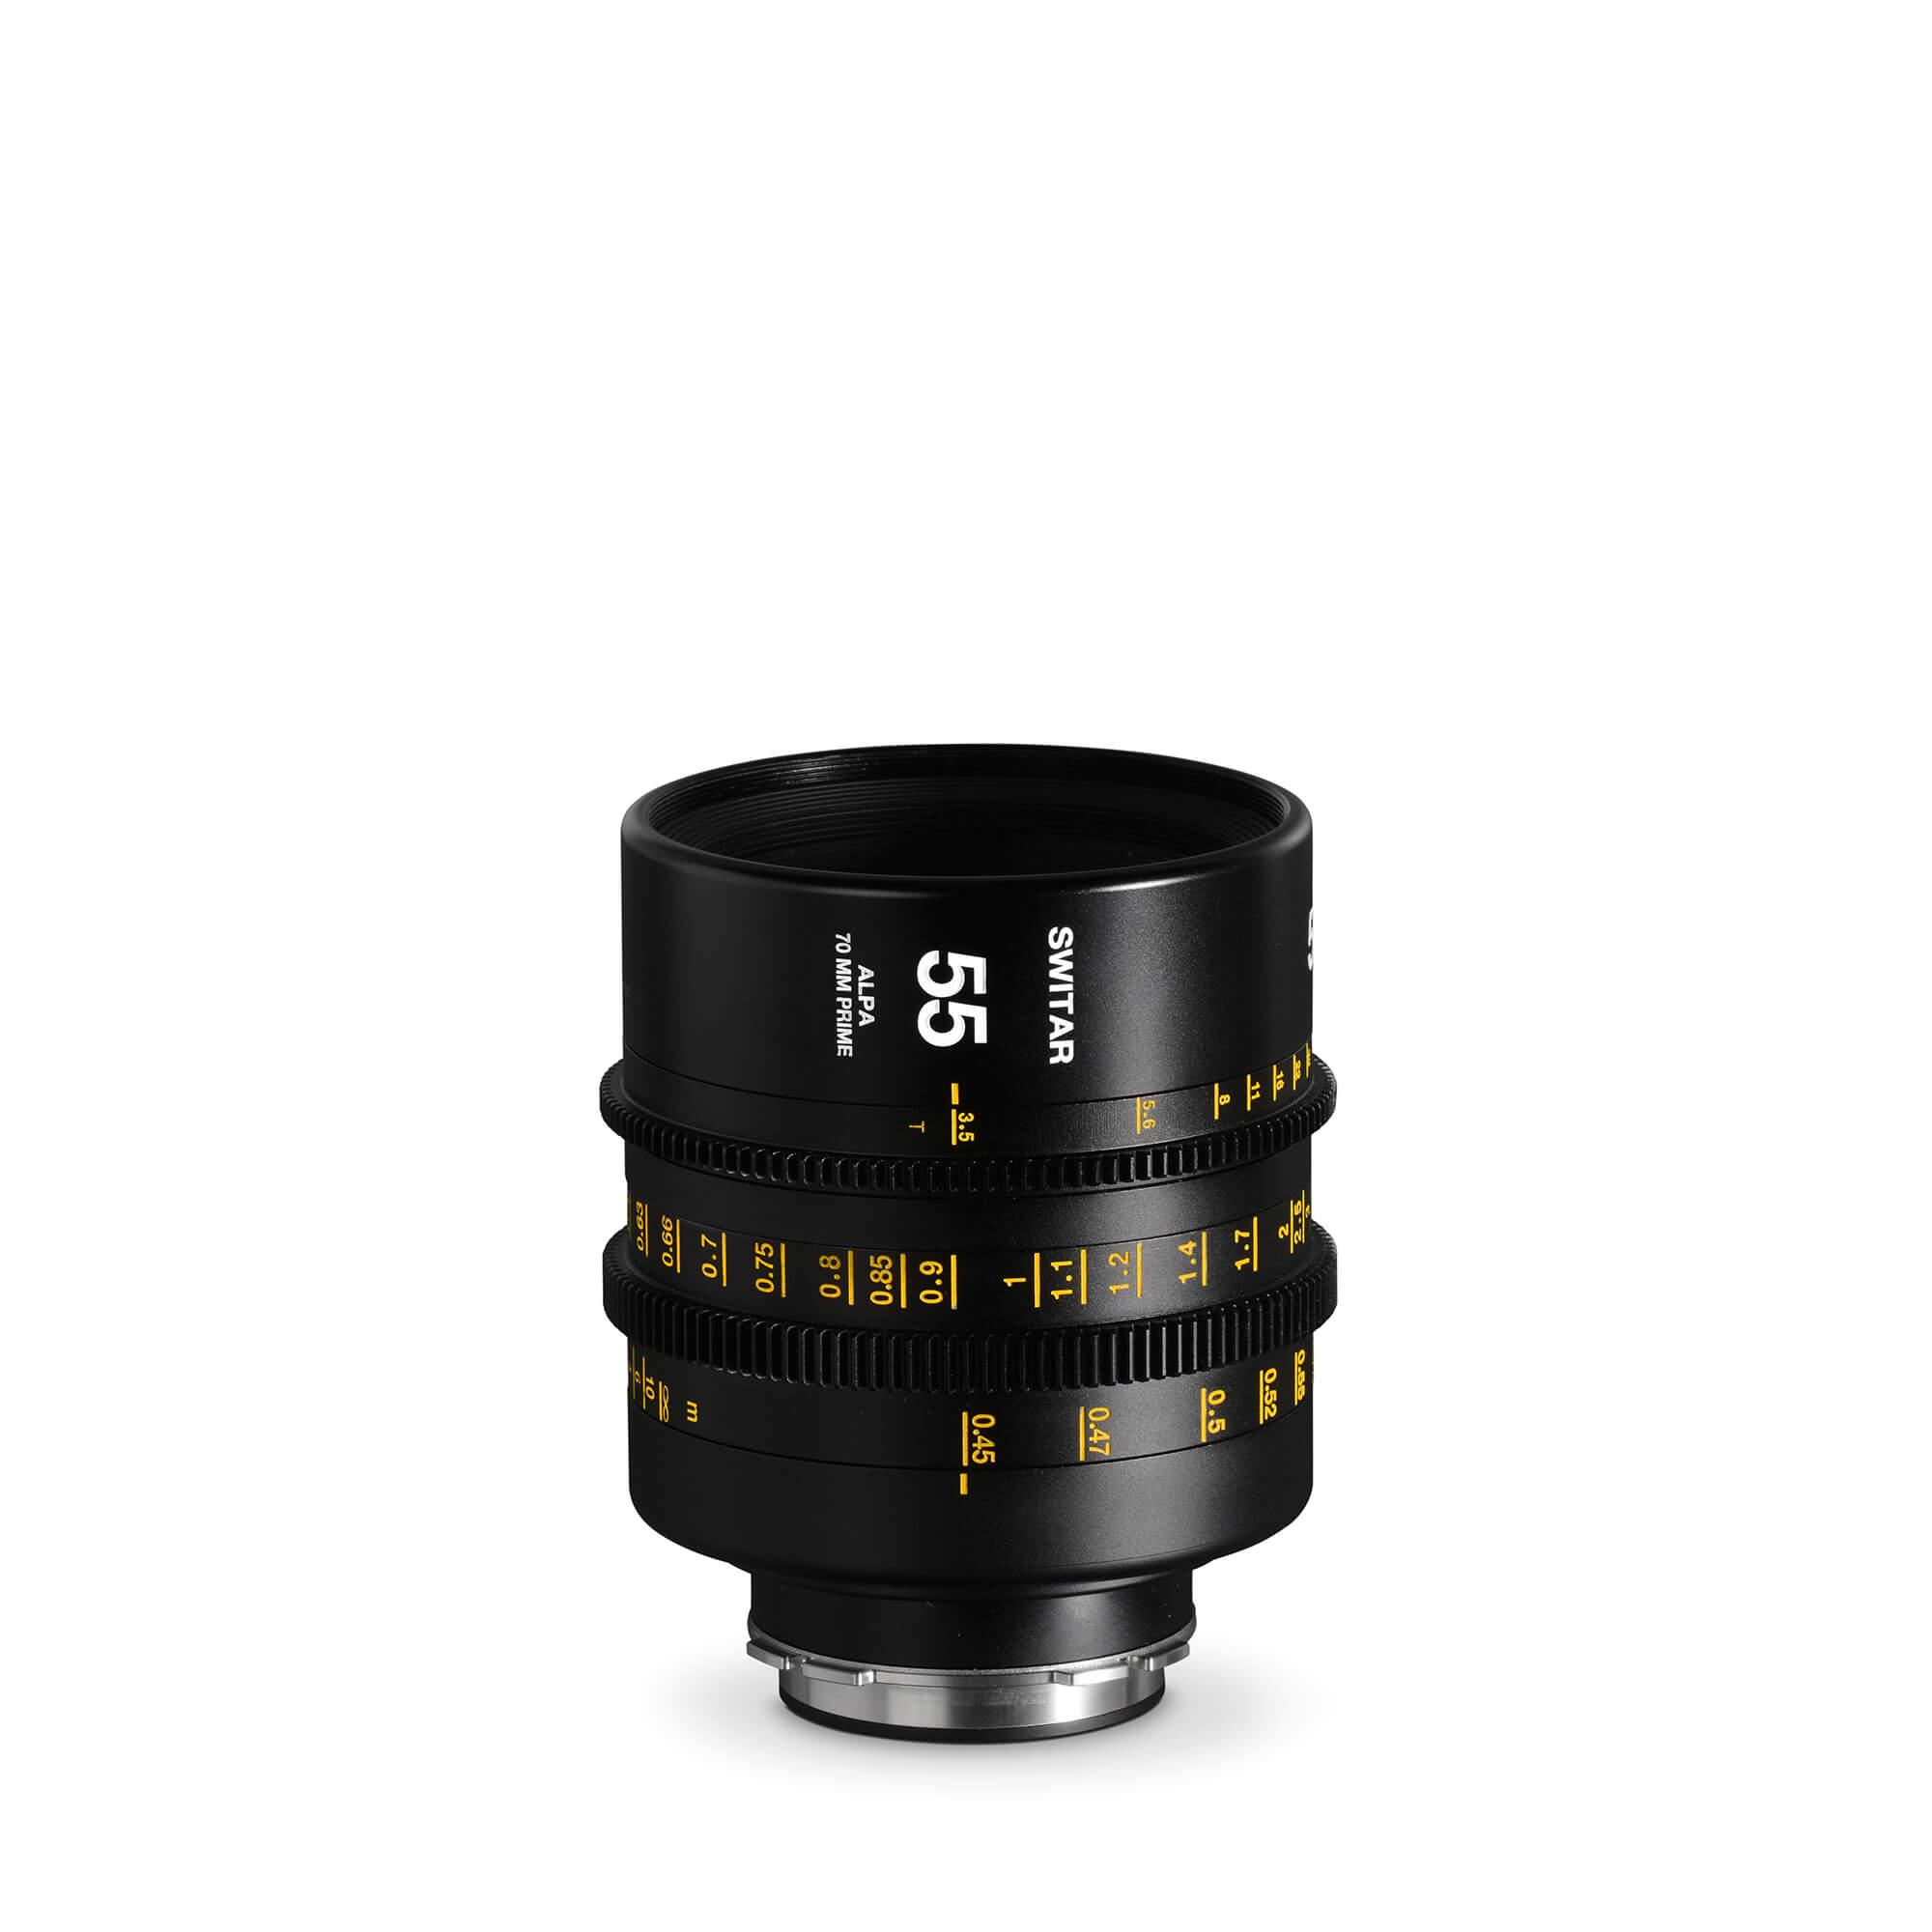 ALPA Switar 2.8/140 mm Cine Prime IC 70 mm - feet